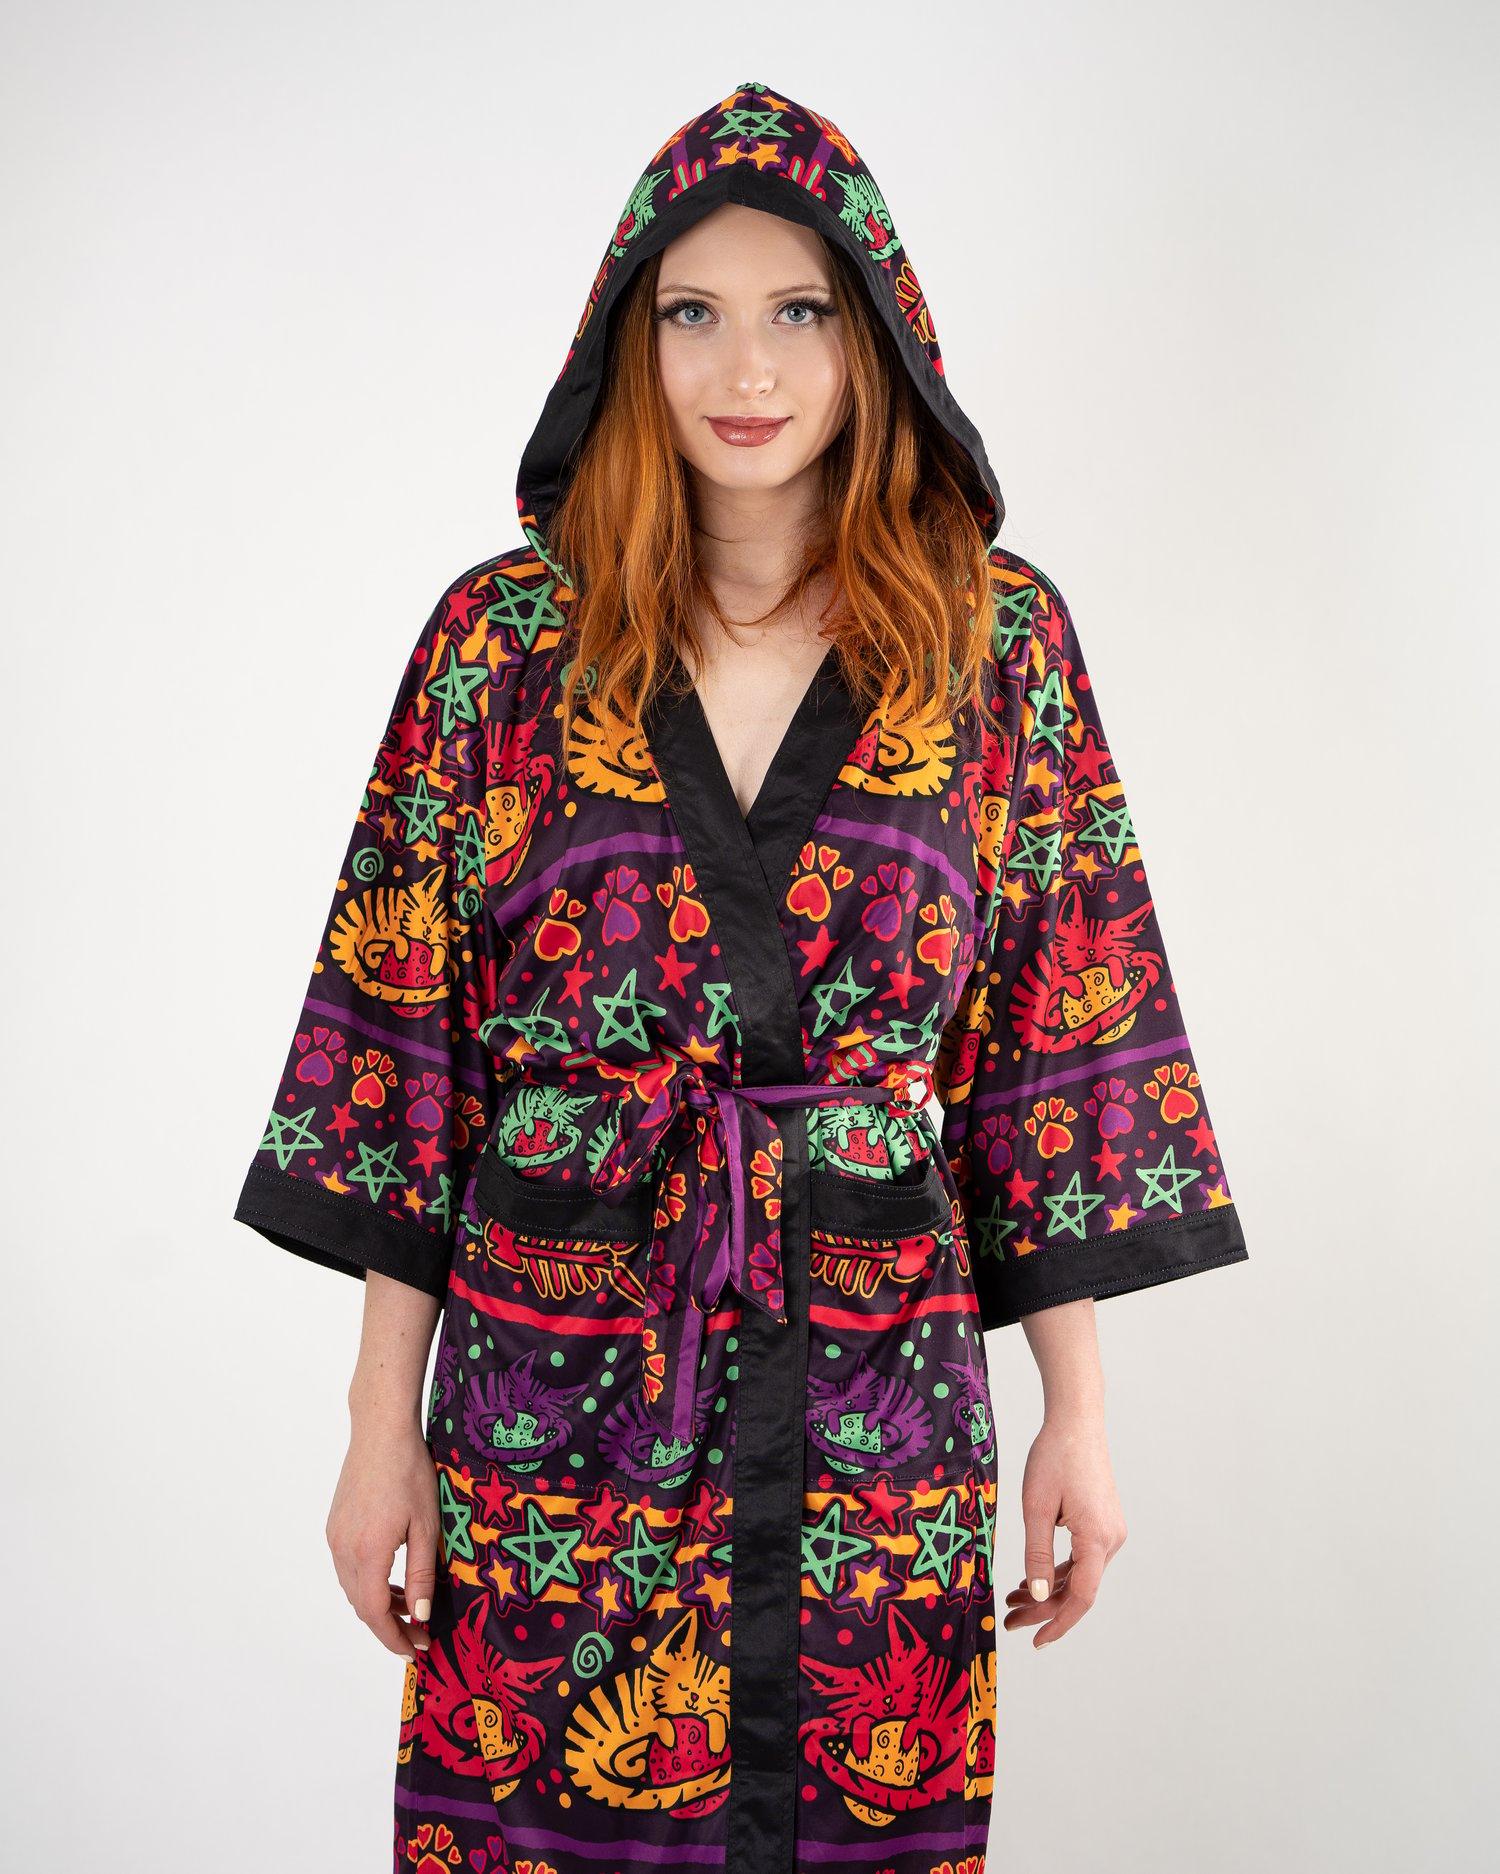 KOOZ - Cat Nap Kimono - (LE 50)